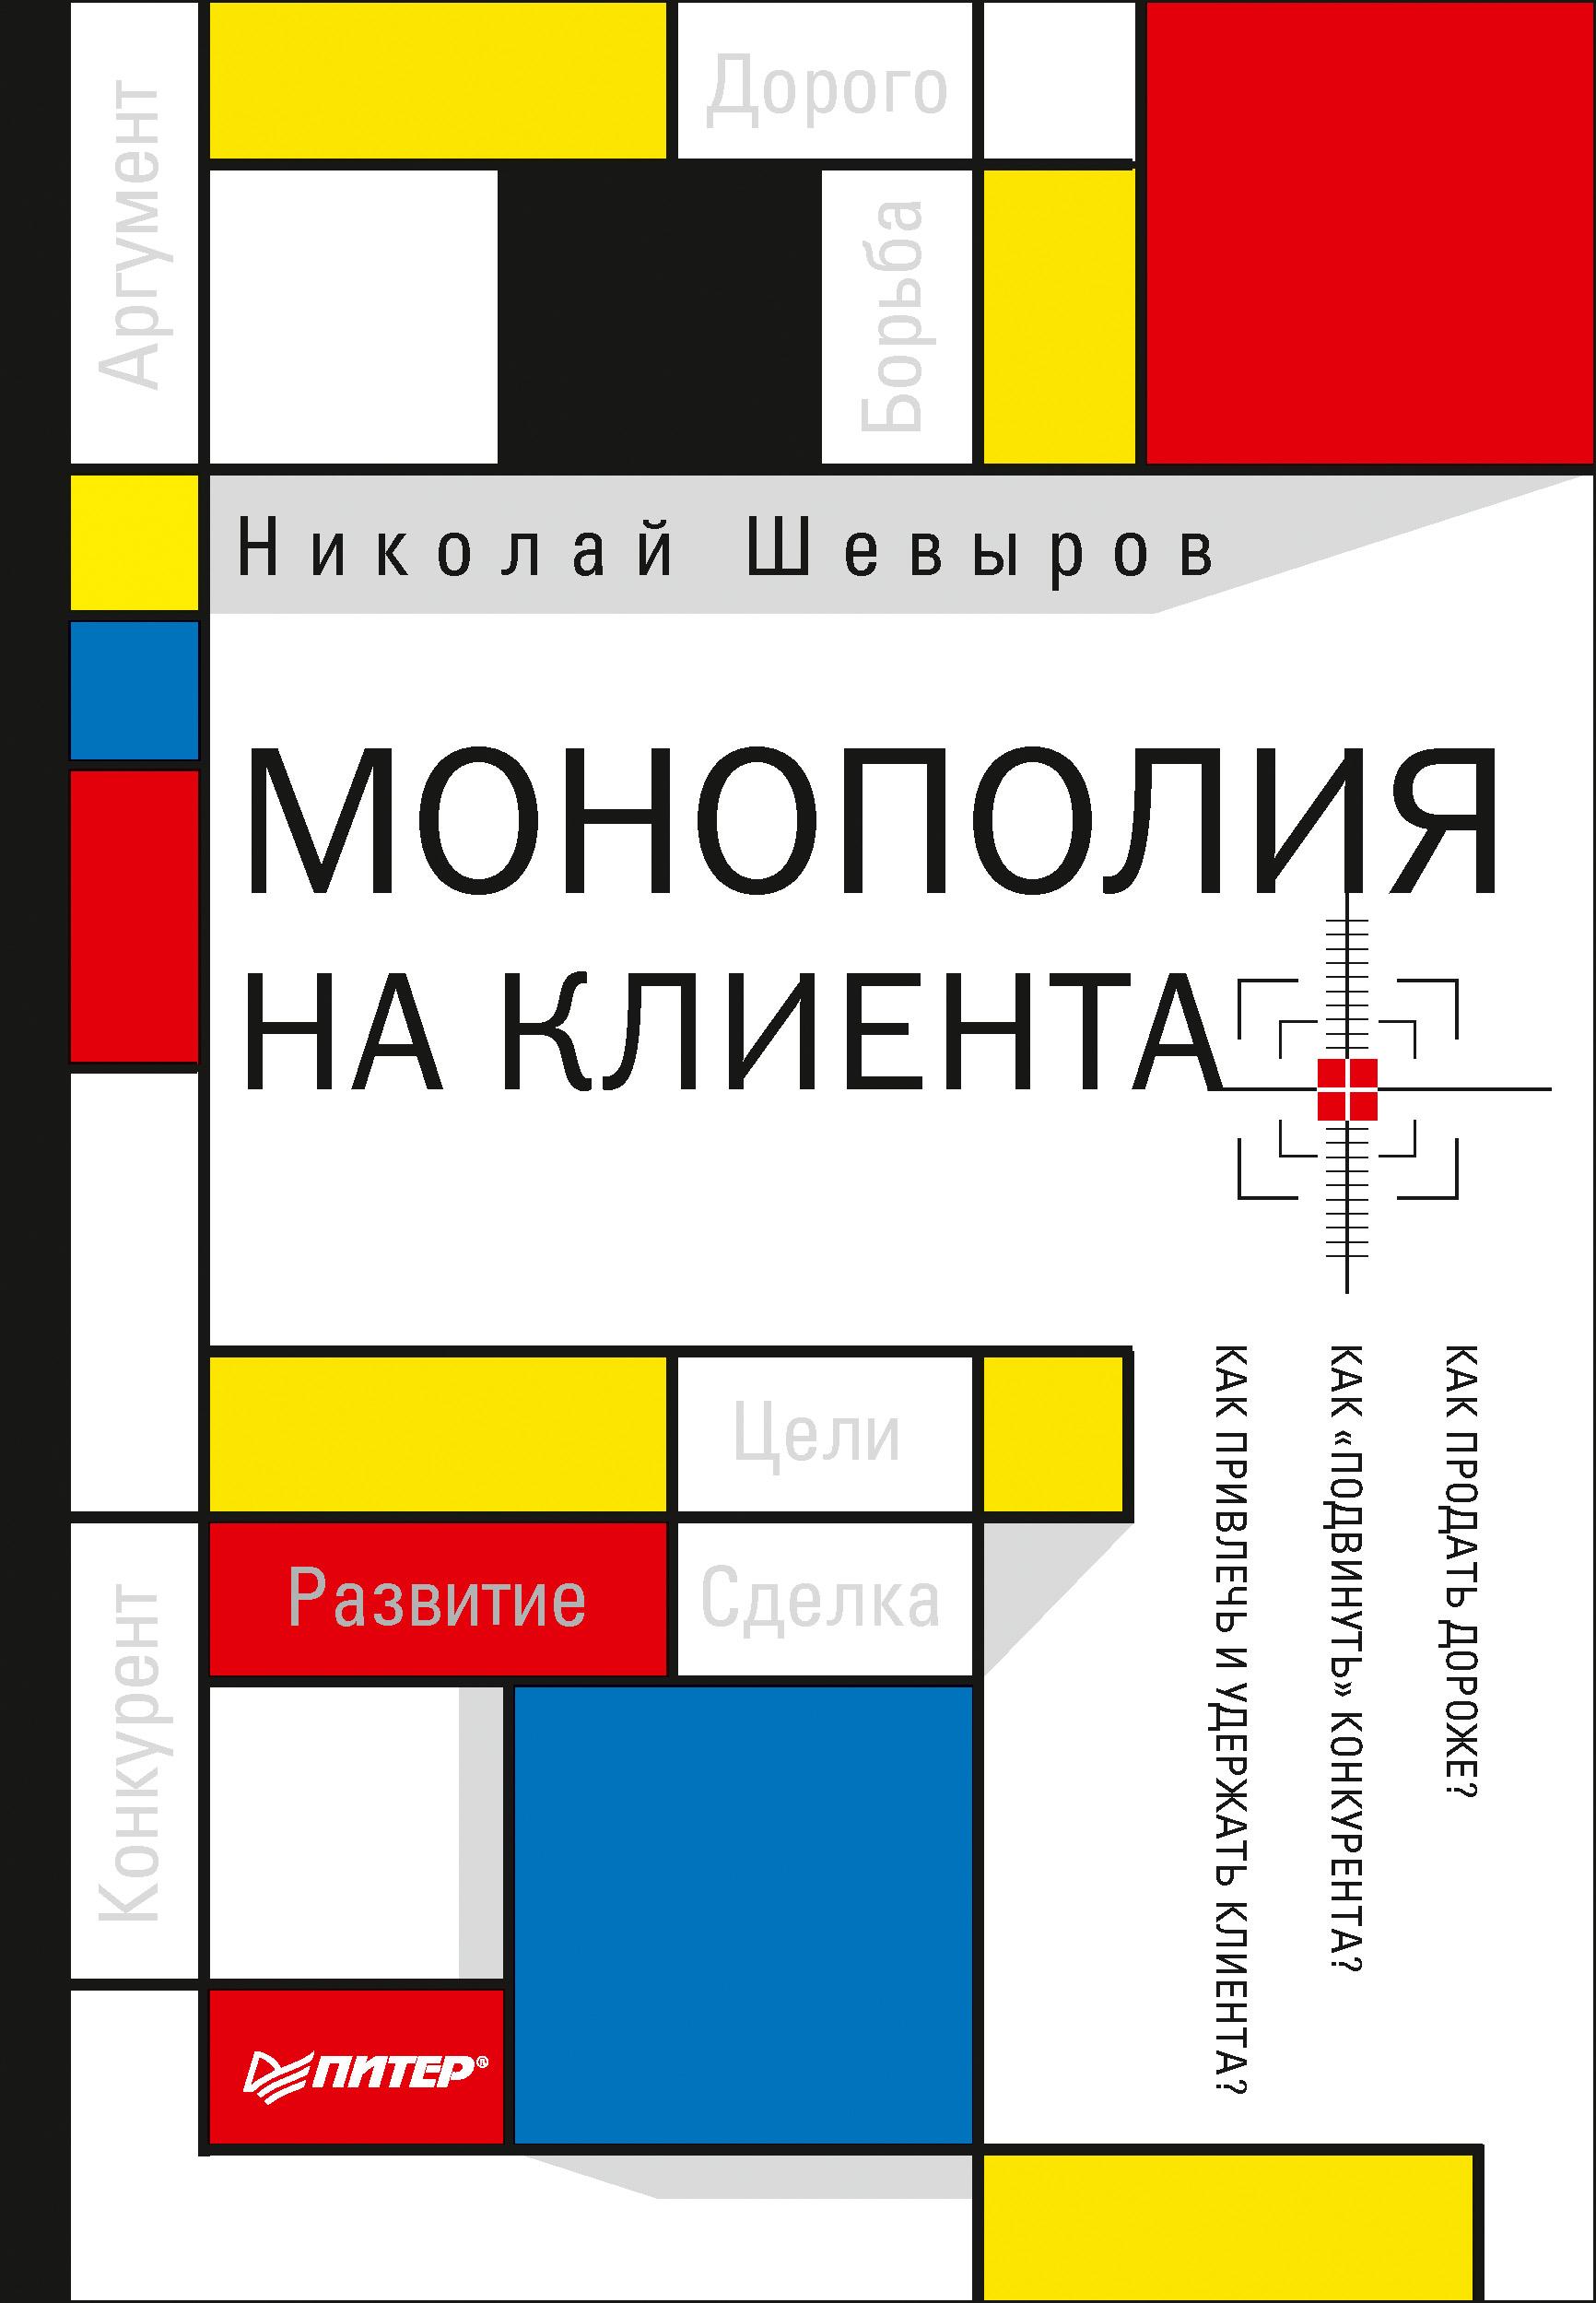 Николай Шевыров Монополия на клиента